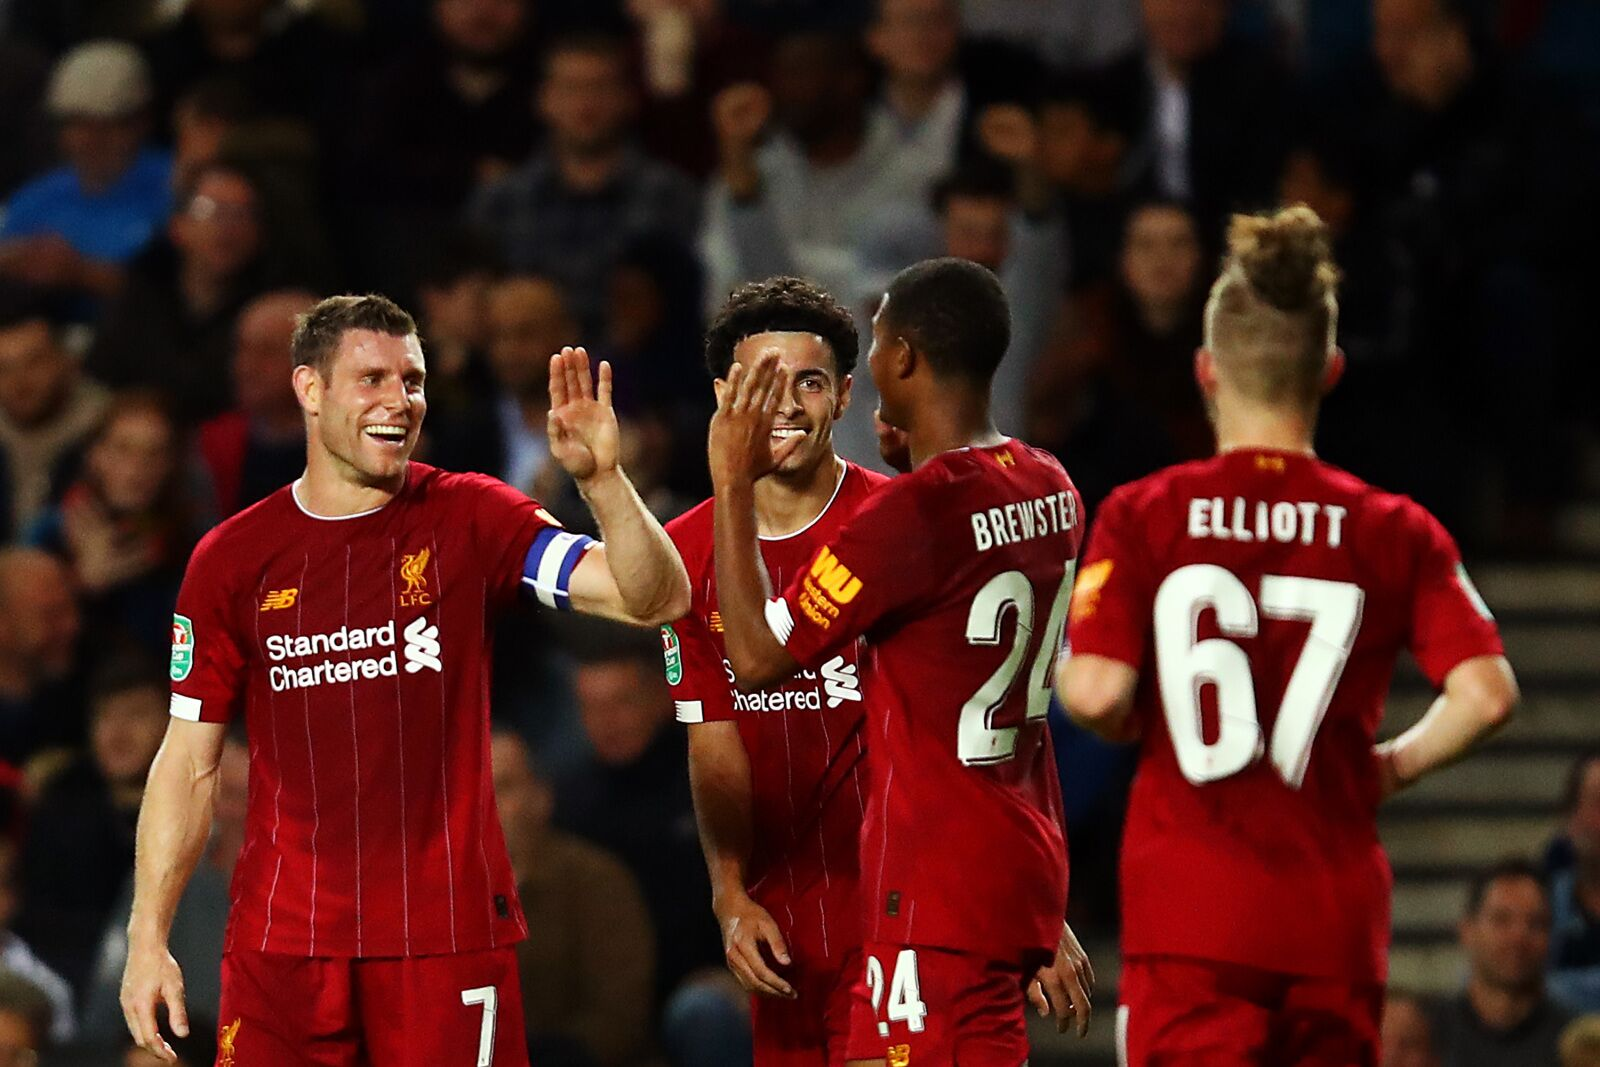 Liverpool: Harvey Elliott overtakes Rhian Brewster in attack pecking order